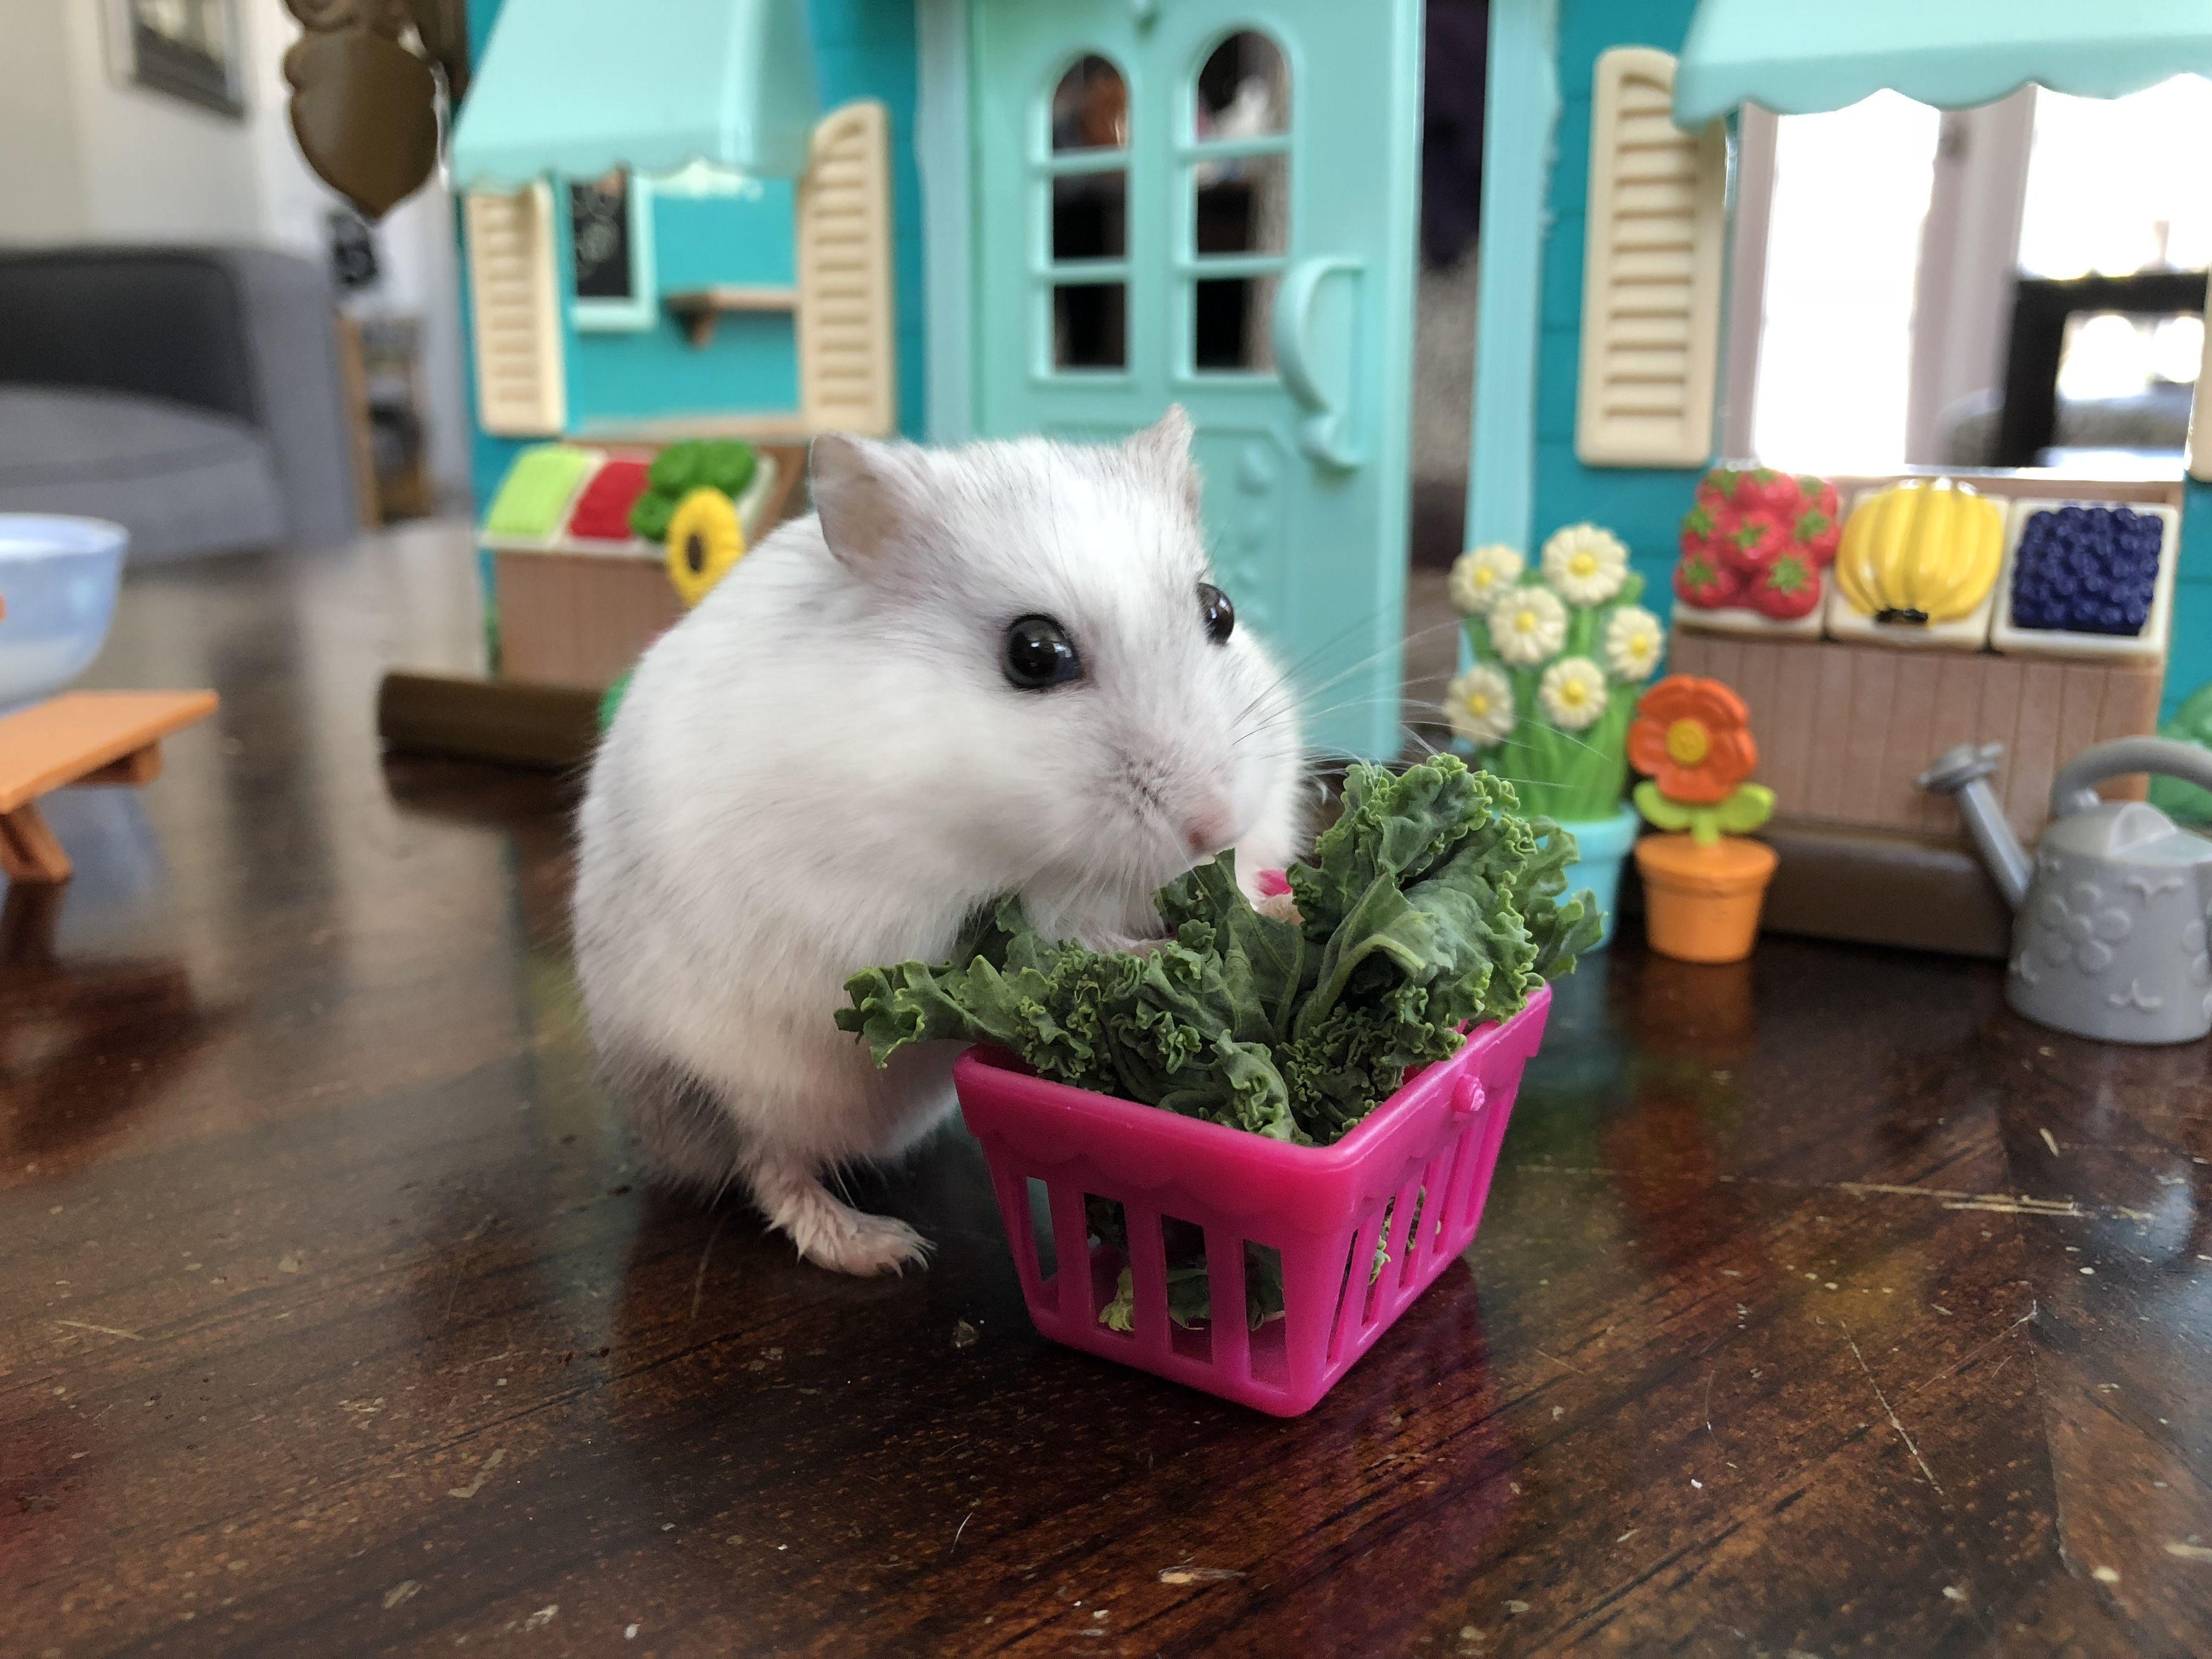 White Djungarian Dwarf Hamster Her Favorite Food Is Kale